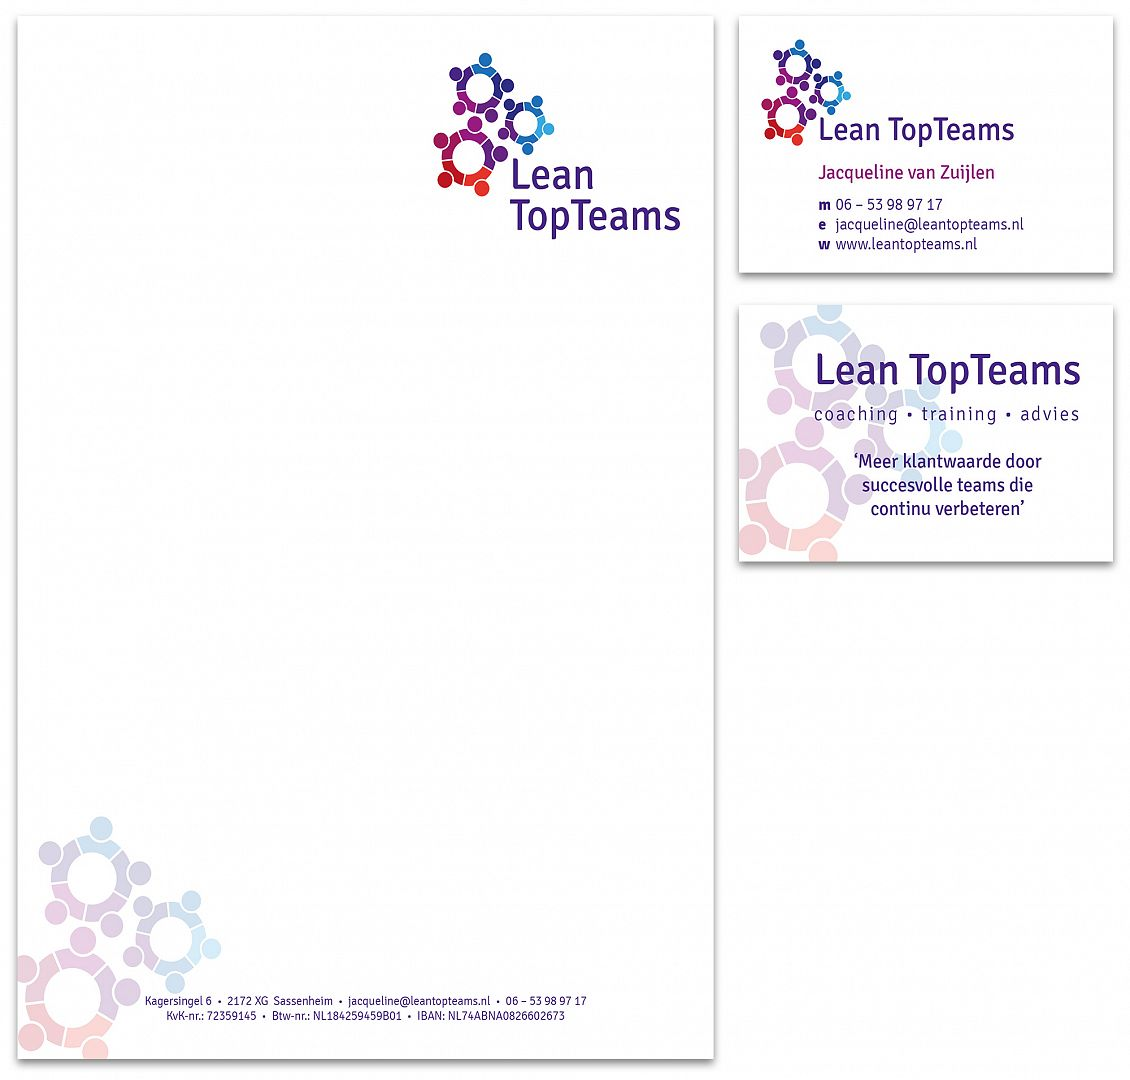 Lean Topteams